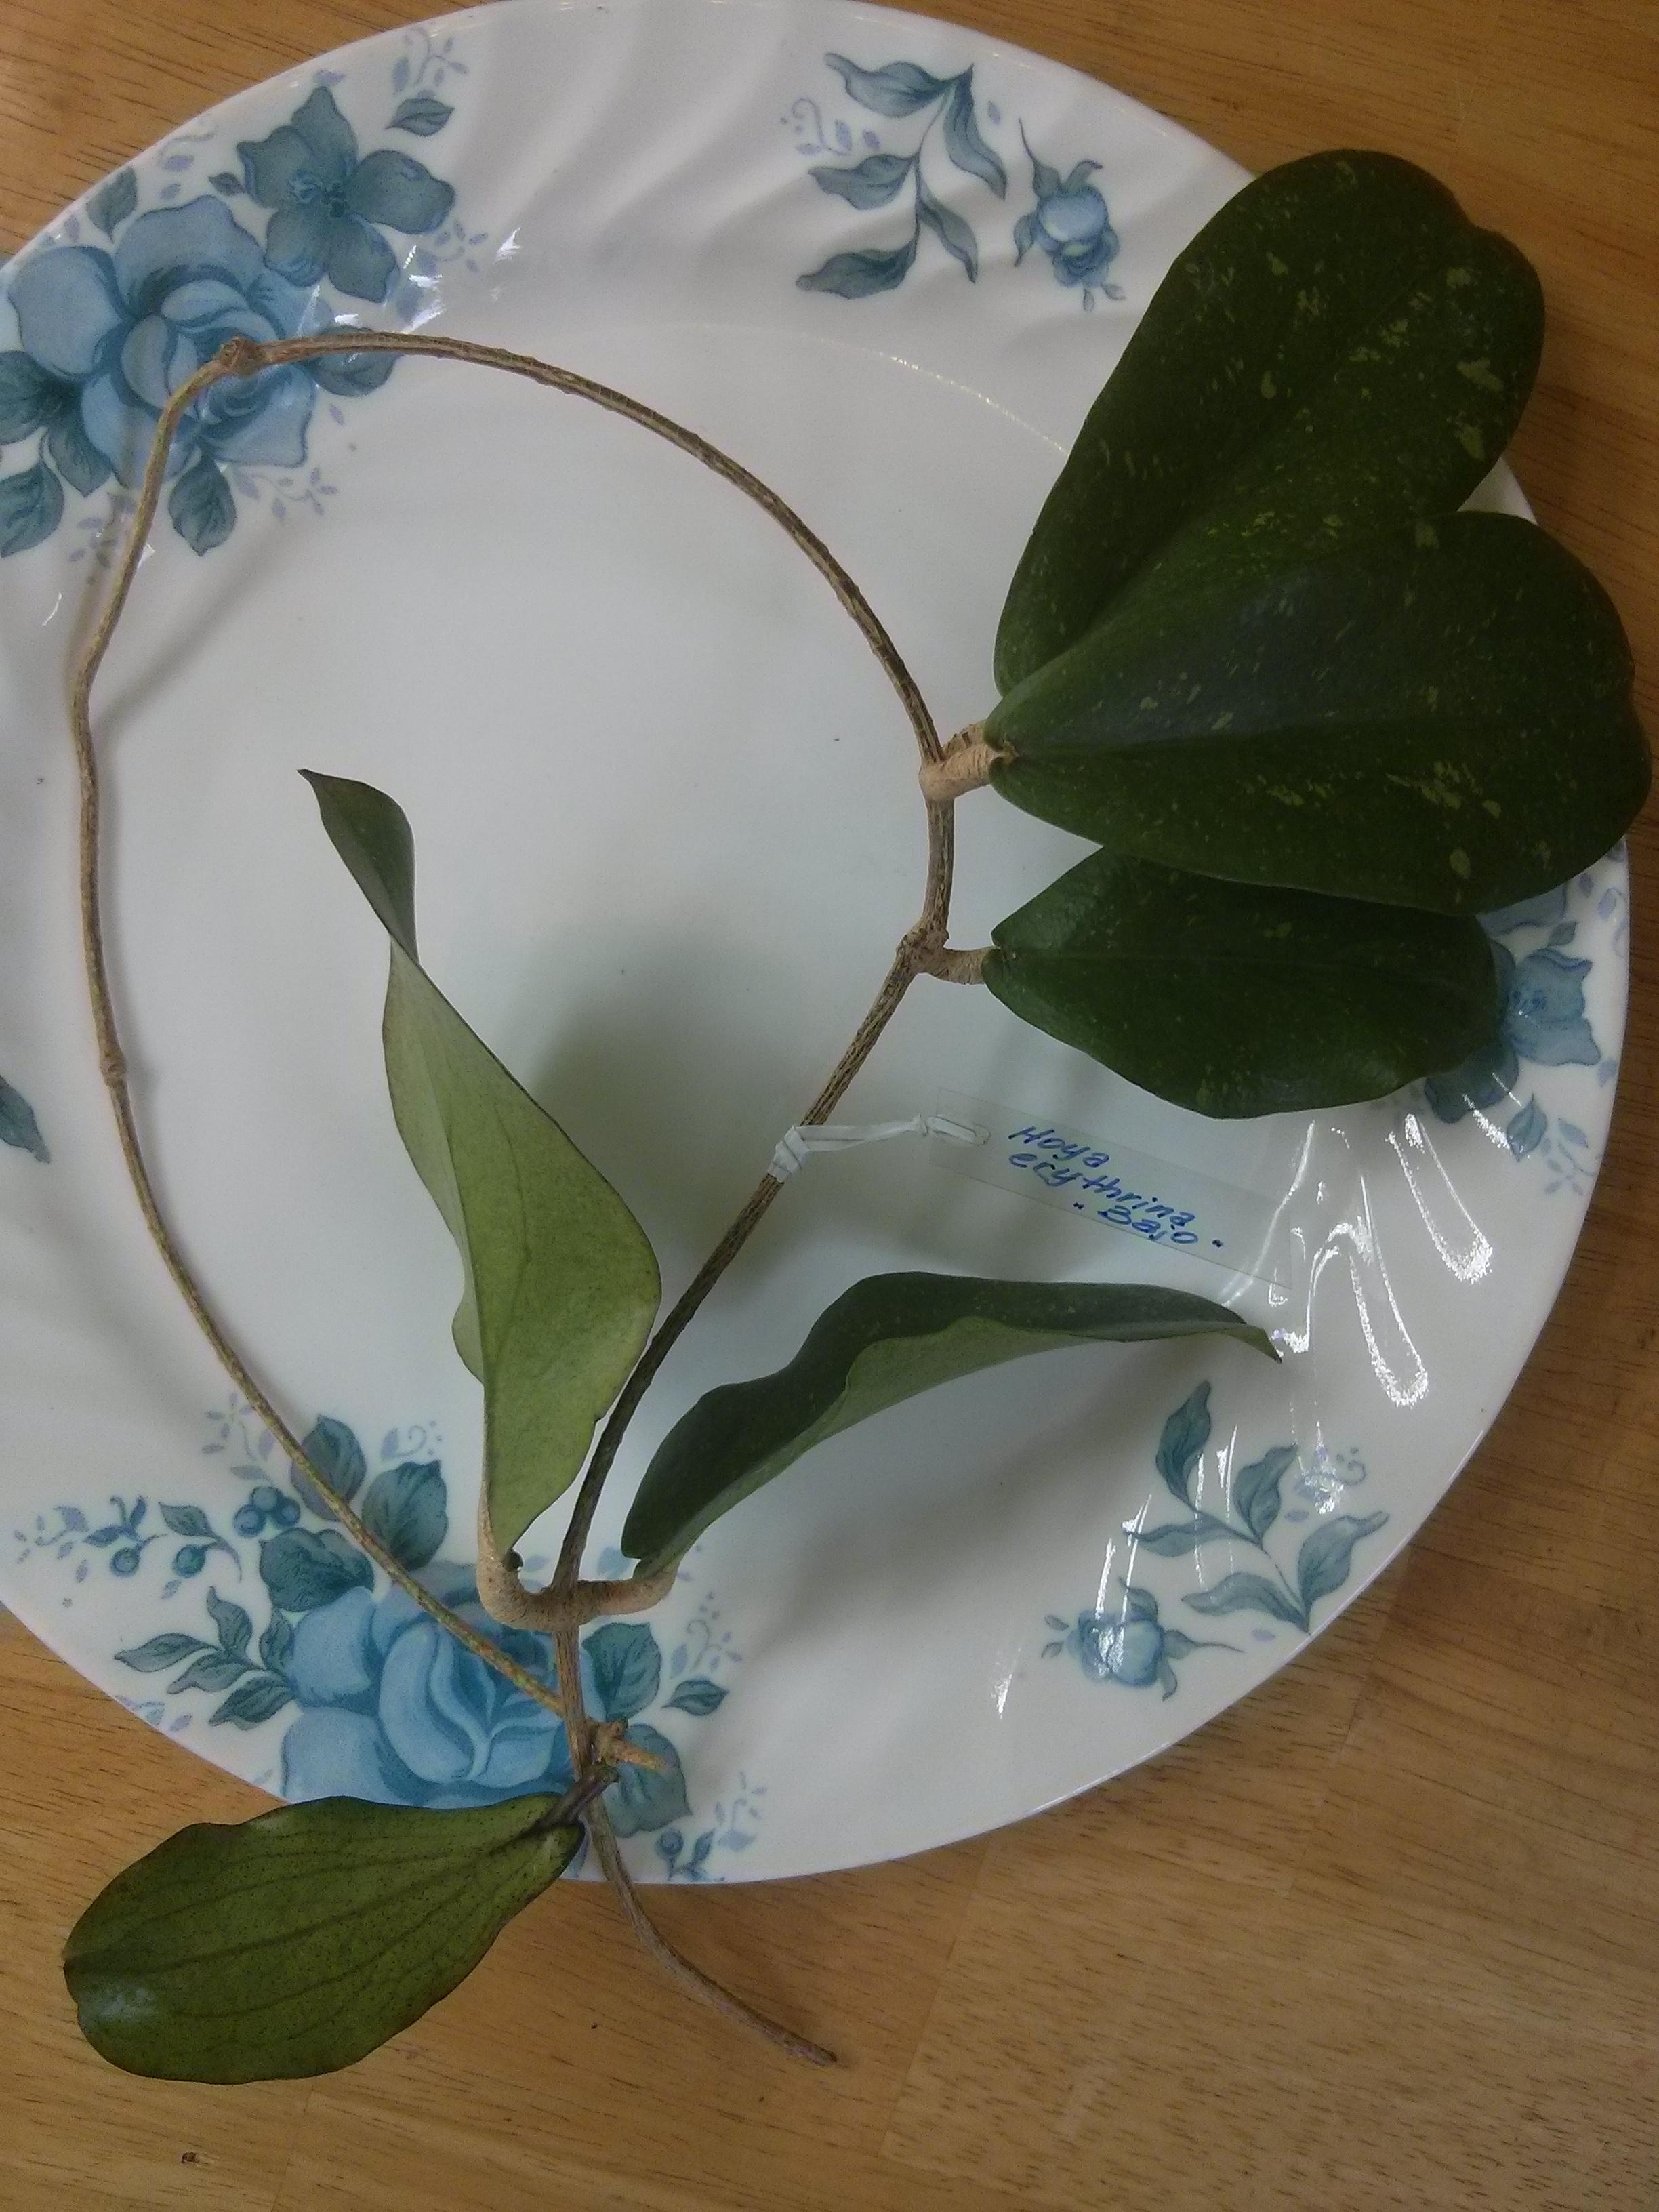 erythrina 'Bajo'